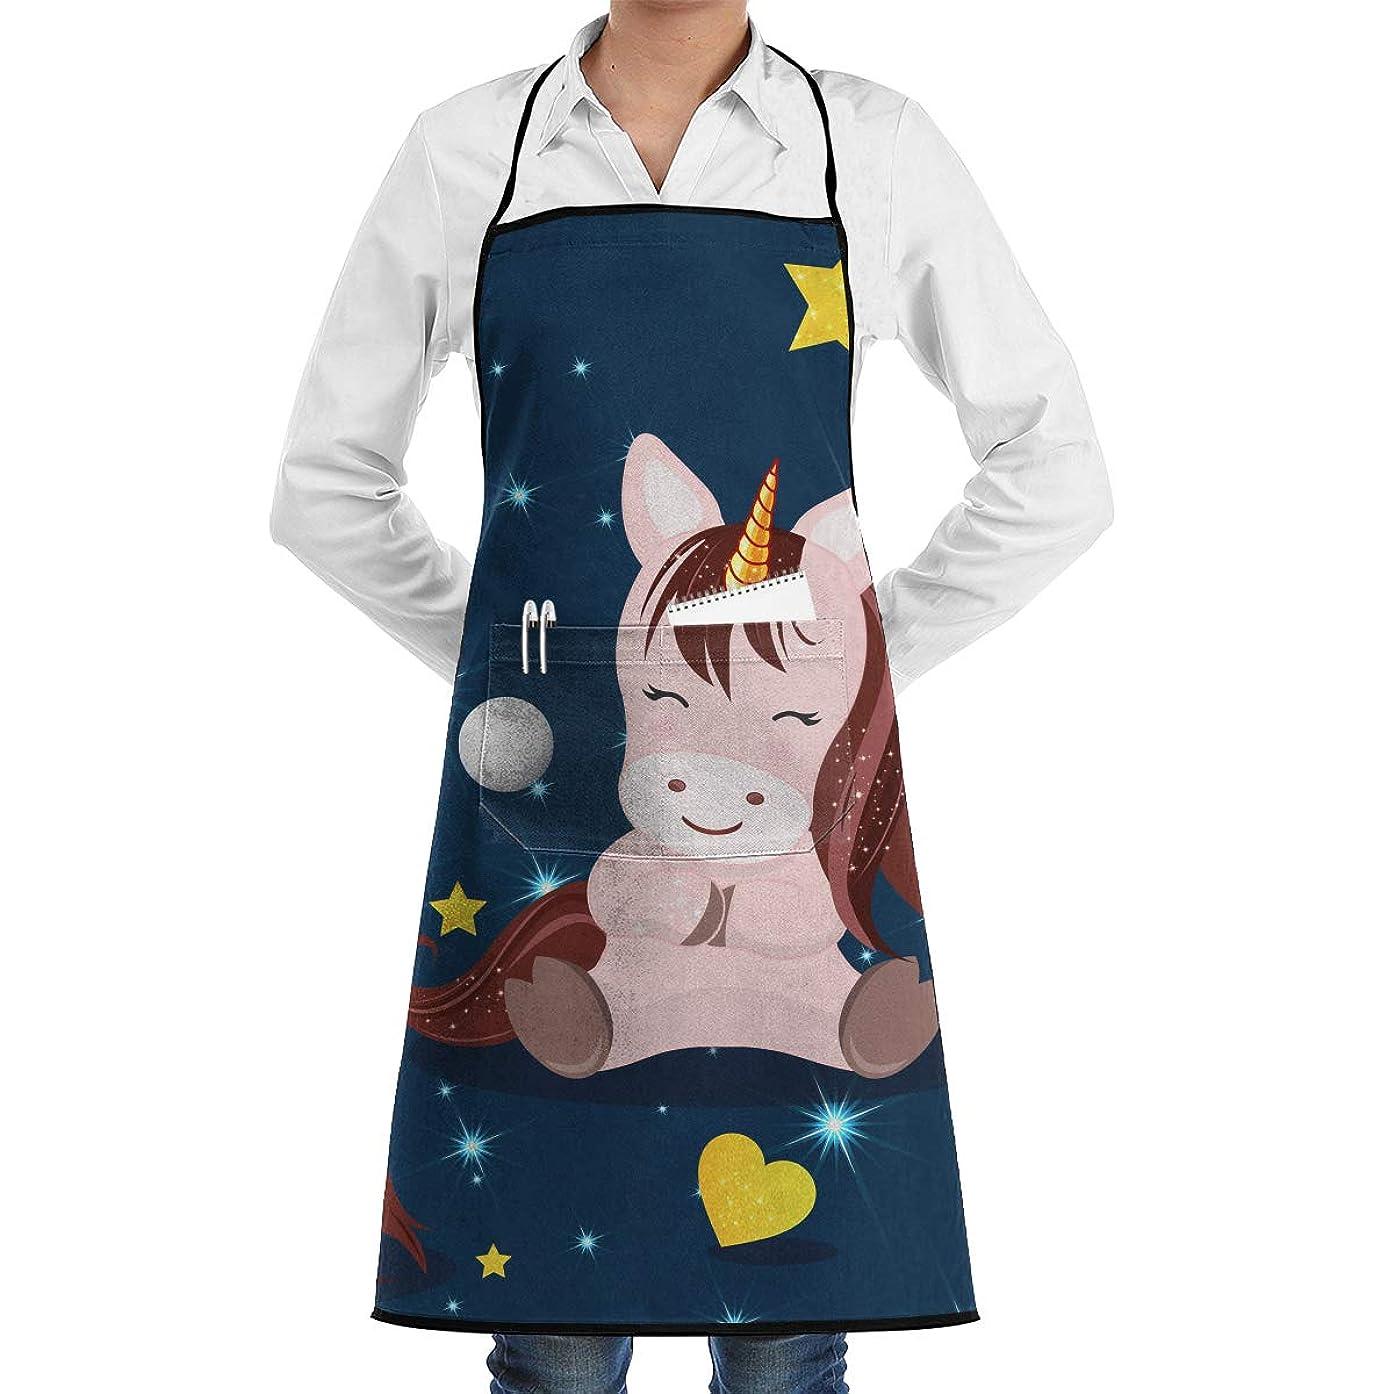 Kitchen Chef Bib Apron Cartoon Unicorn Neck Waist Tie Center Kangaroo Pocket Waterproof